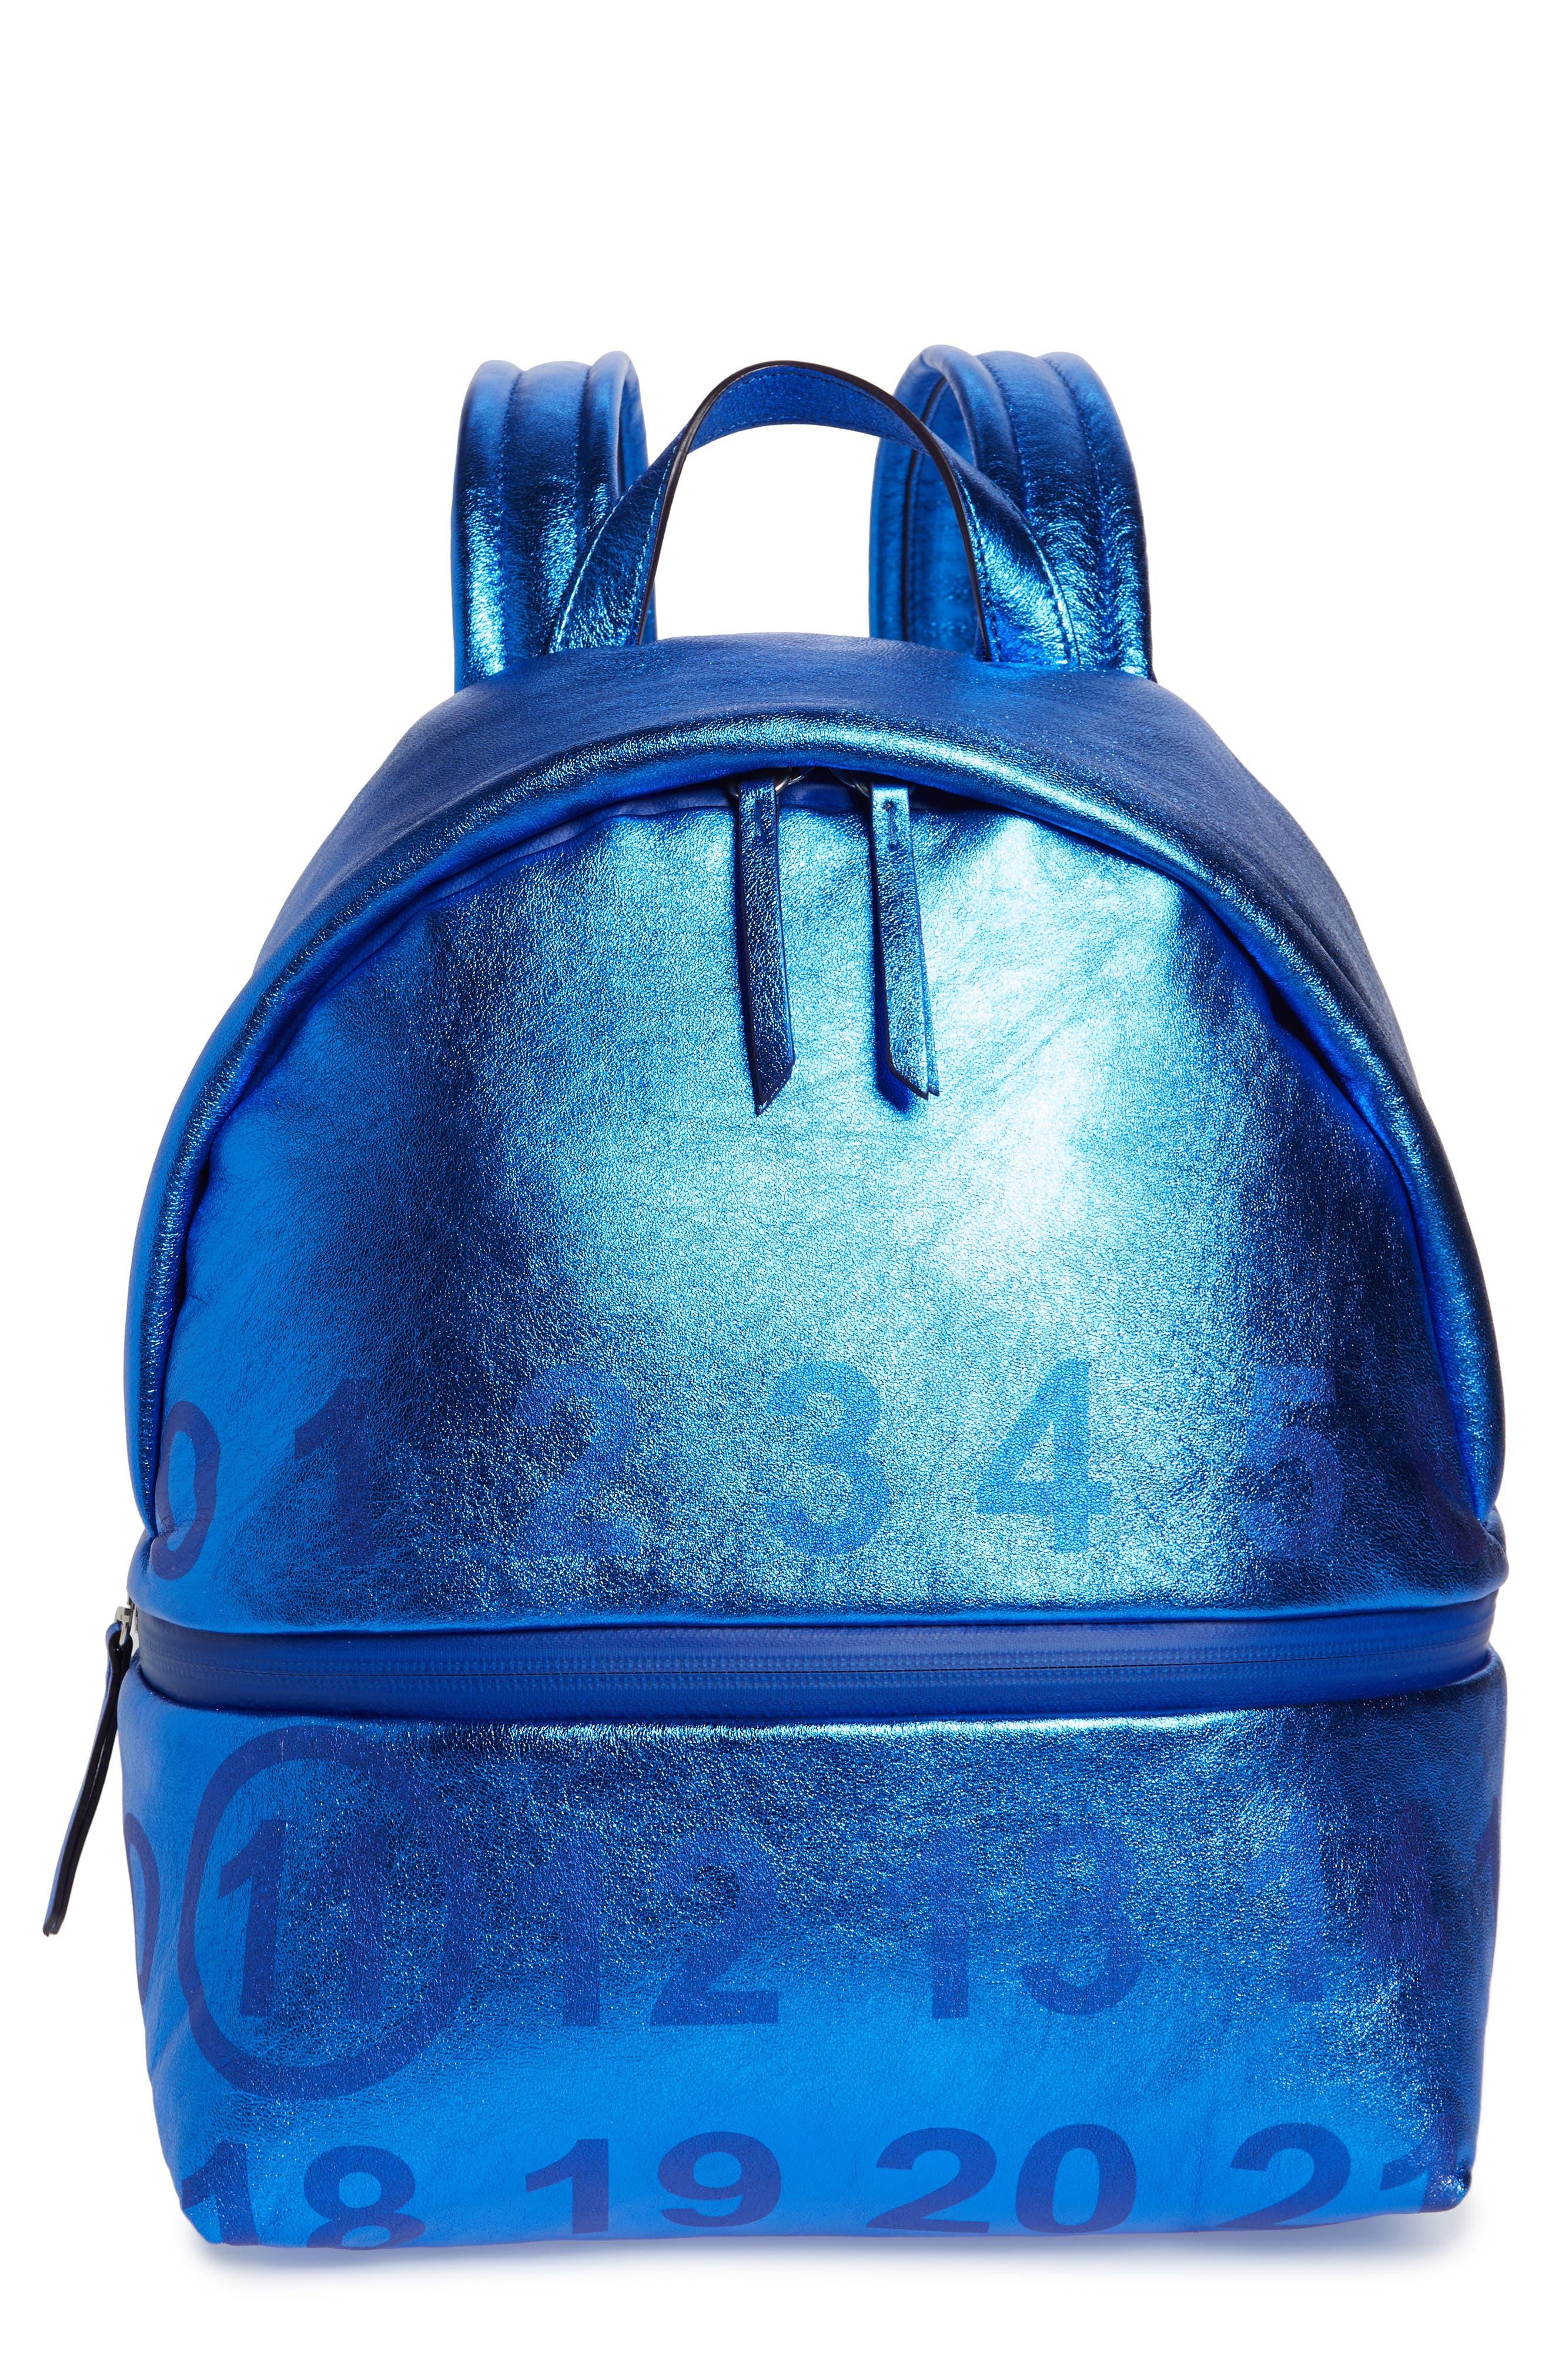 MAISON MARGIELA,                             Medium Number Print Backpack,                             Main thumbnail 1, color,                             DAZZLING BLUE